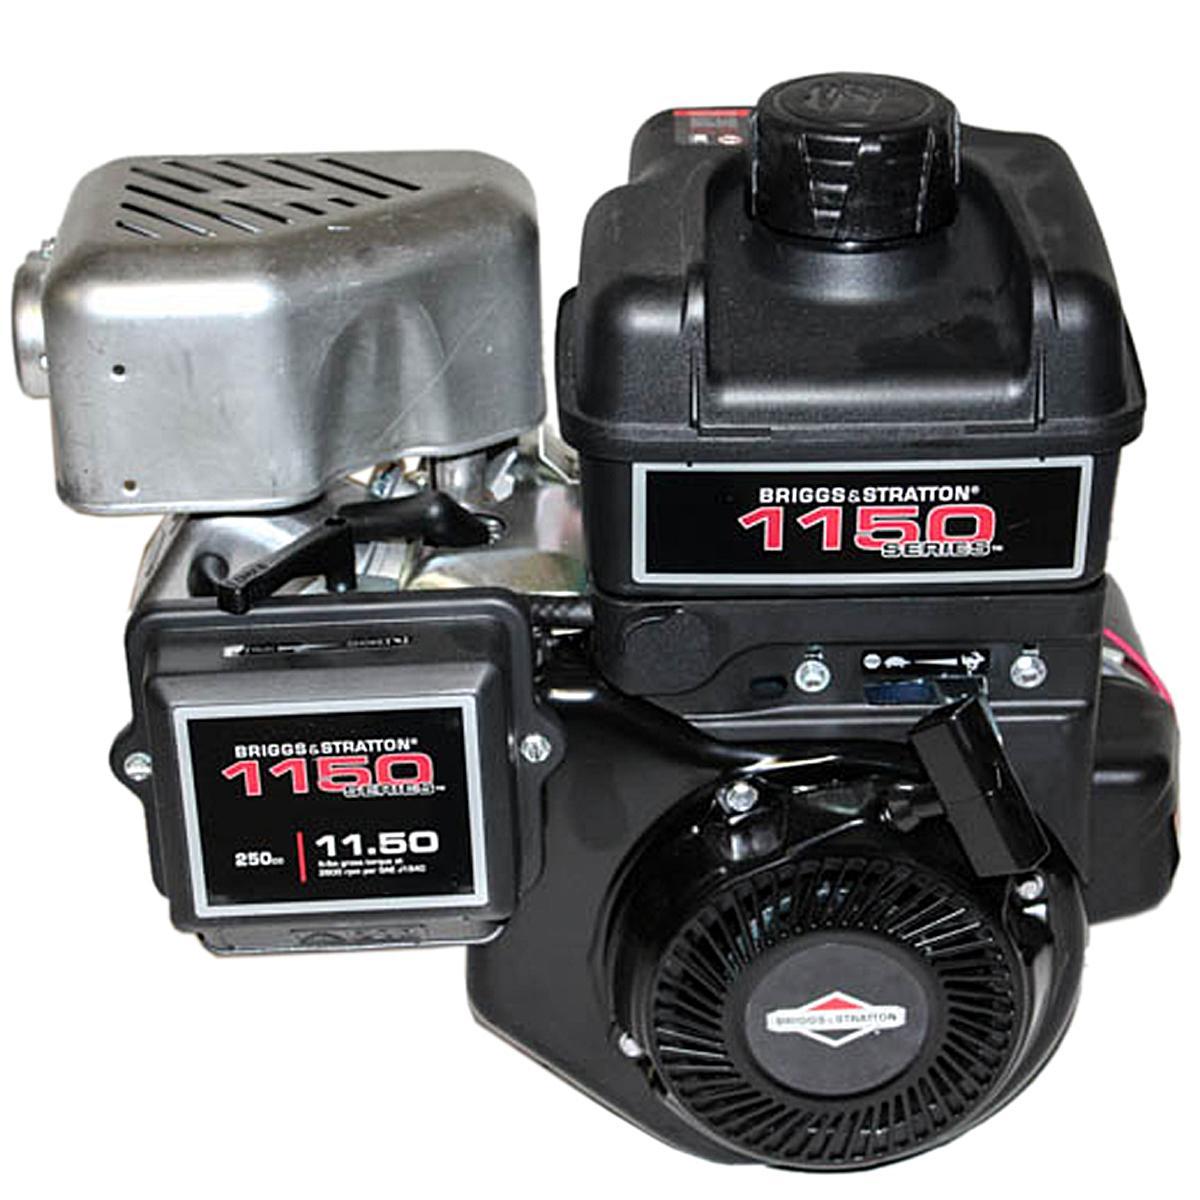 "1150 Series Horizontal 3/4"" x 1.457"" Shaft, Intek OHV, Electric & Recoil Start, Briggs & Stratton Engine"